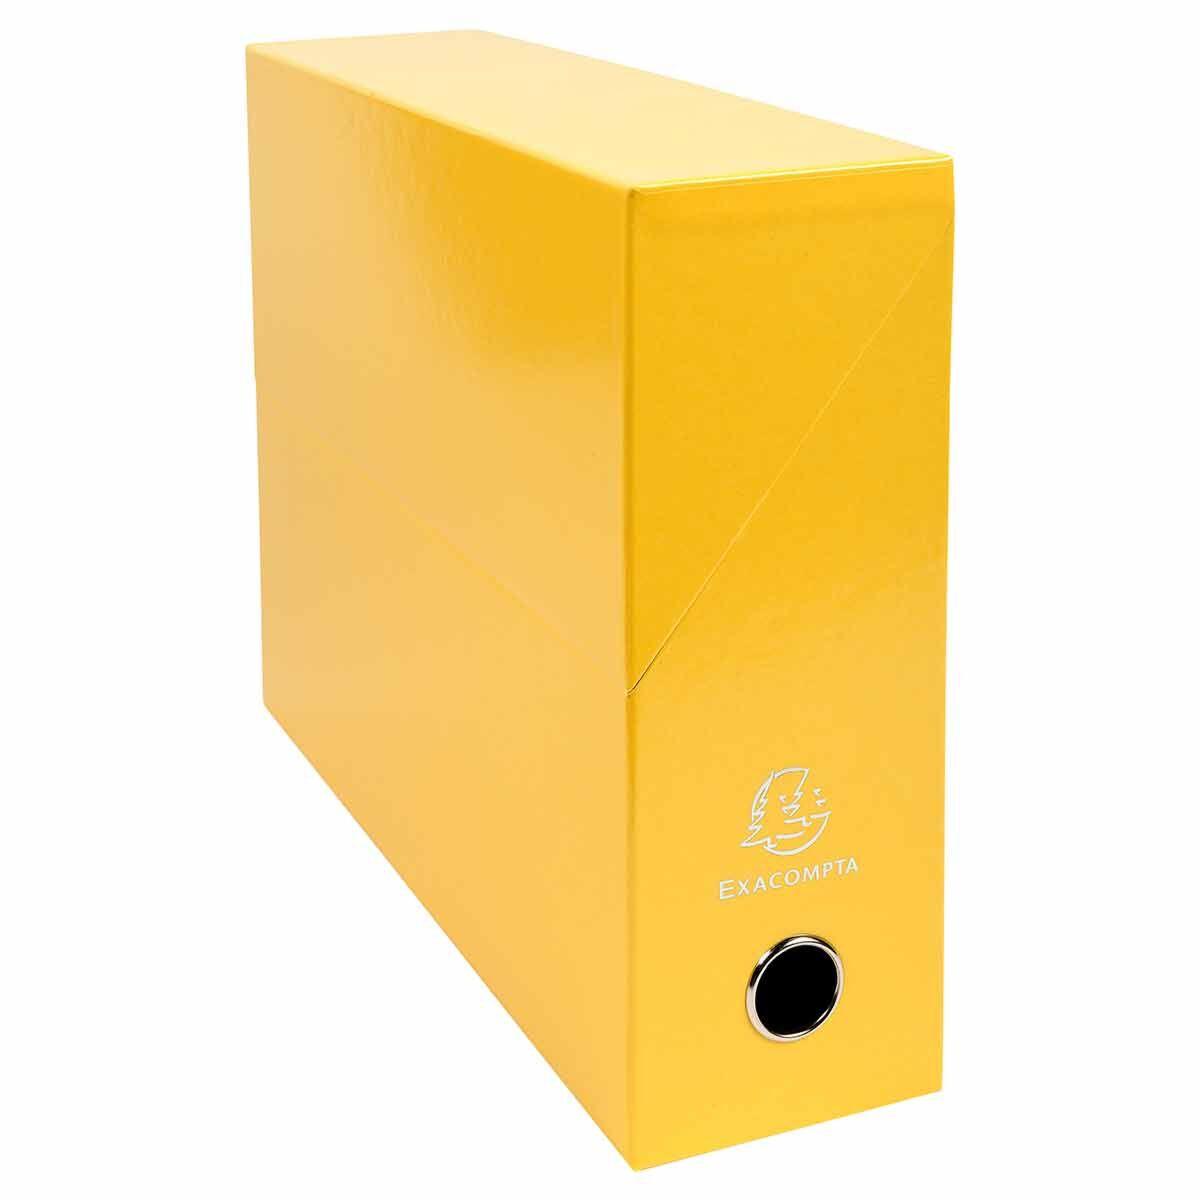 Exacompta Iderama Filing Box 90mm Pack of 5 Yellow